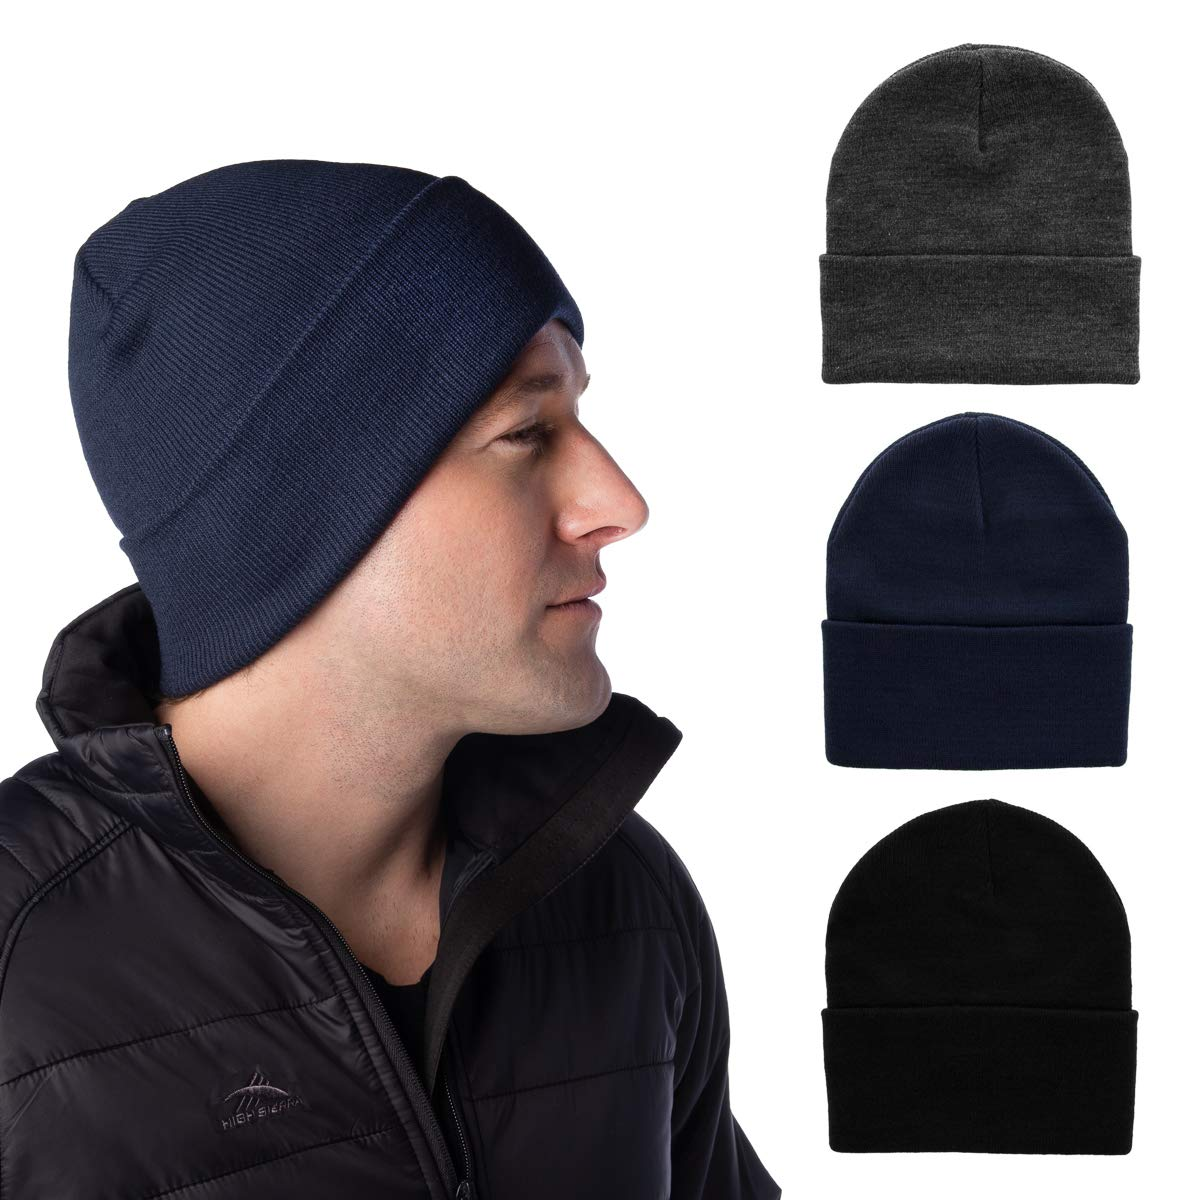 42f7f0a91b08d DG Hill Set of 3 Mens Warm Winter Hats